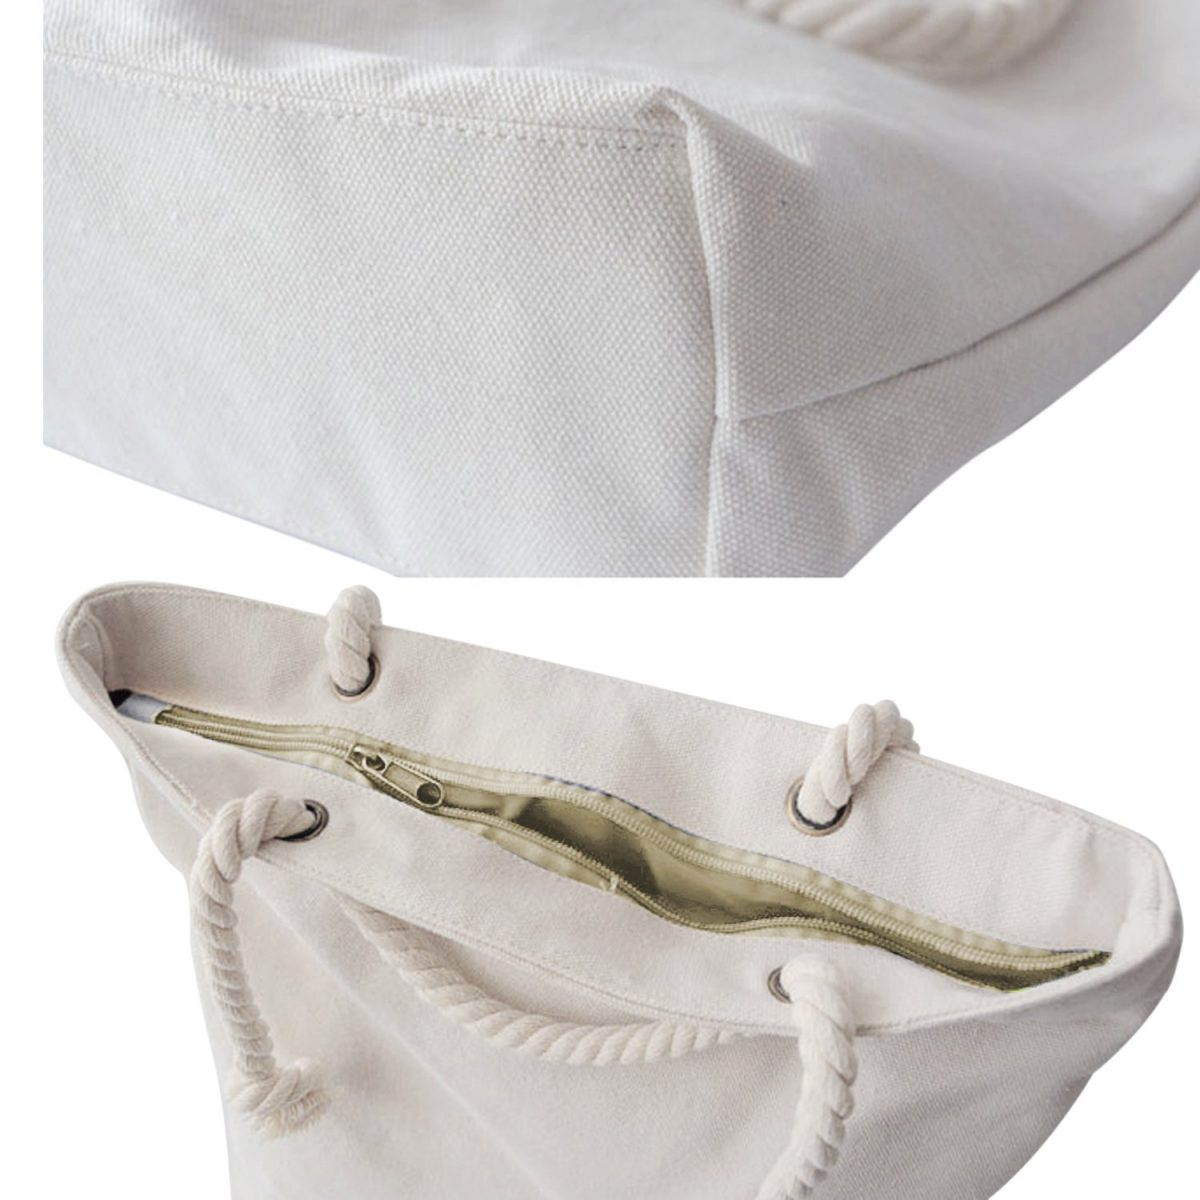 Geometrik Zeminli Goncagül Desenli Fermuarlı Kumaş Çanta Realhomes